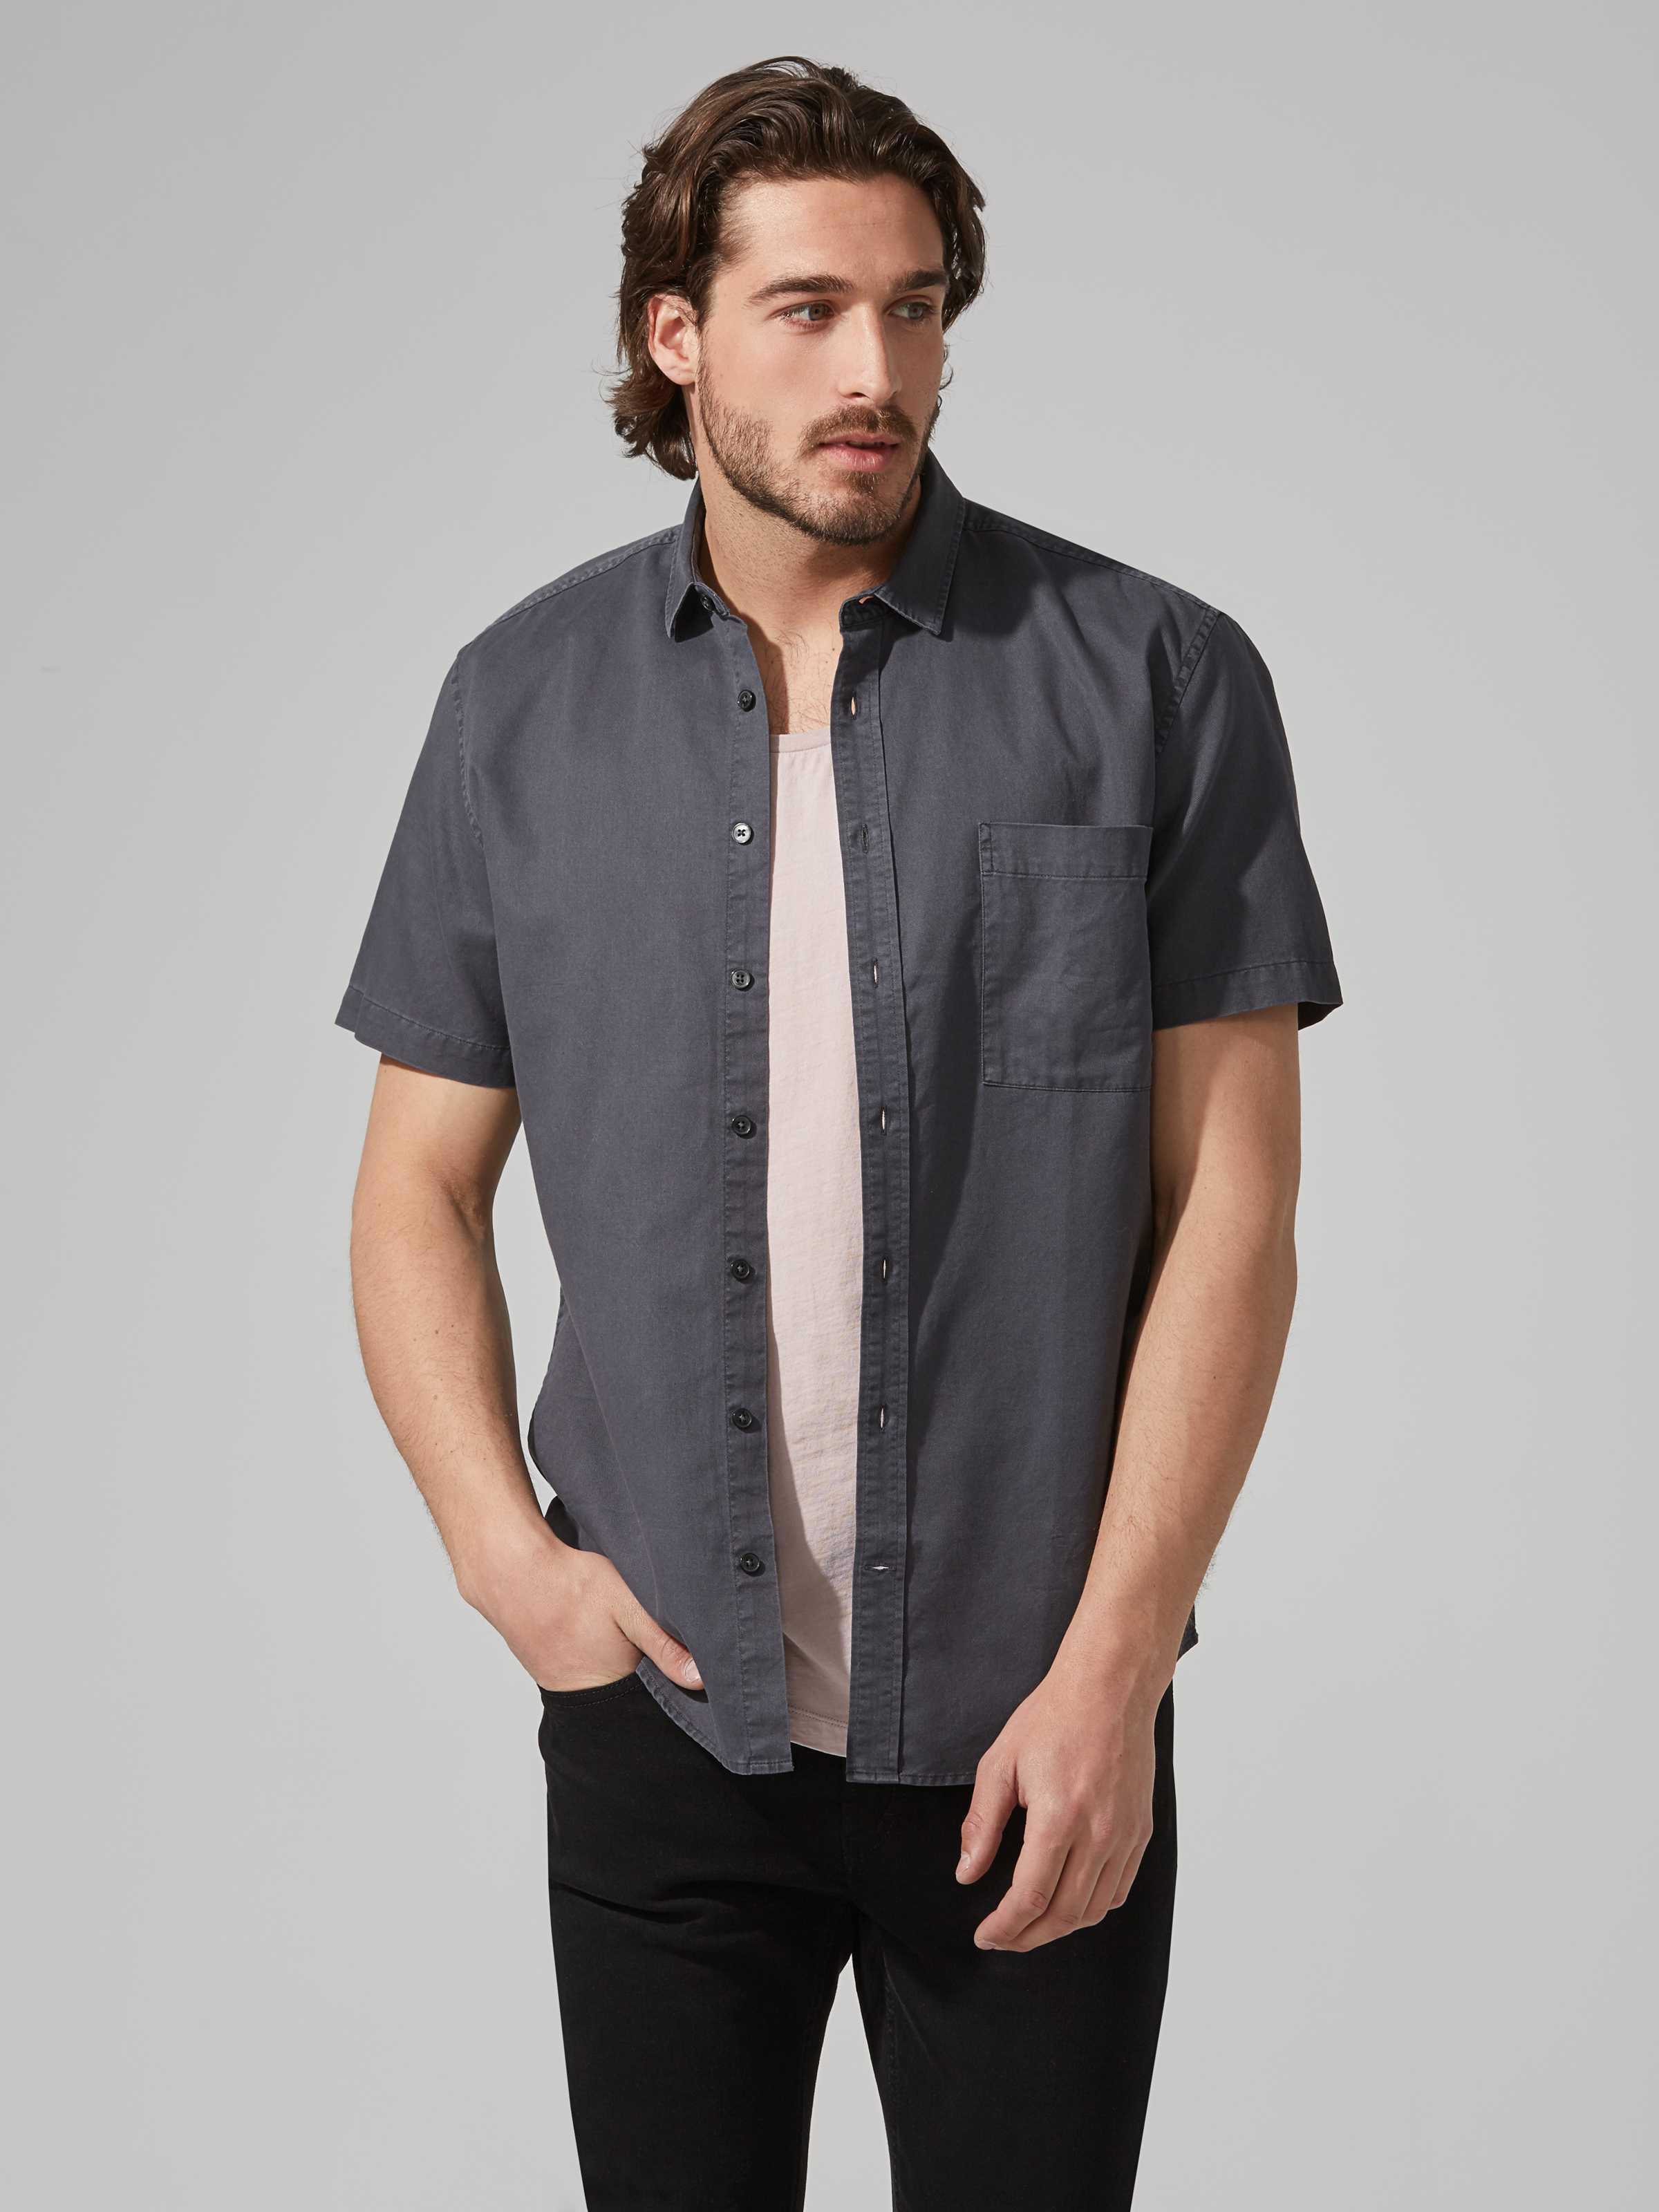 Frank + Oak Supersoft Tencel-cotton Fluid Short-sleeve Shirt In Washed Black